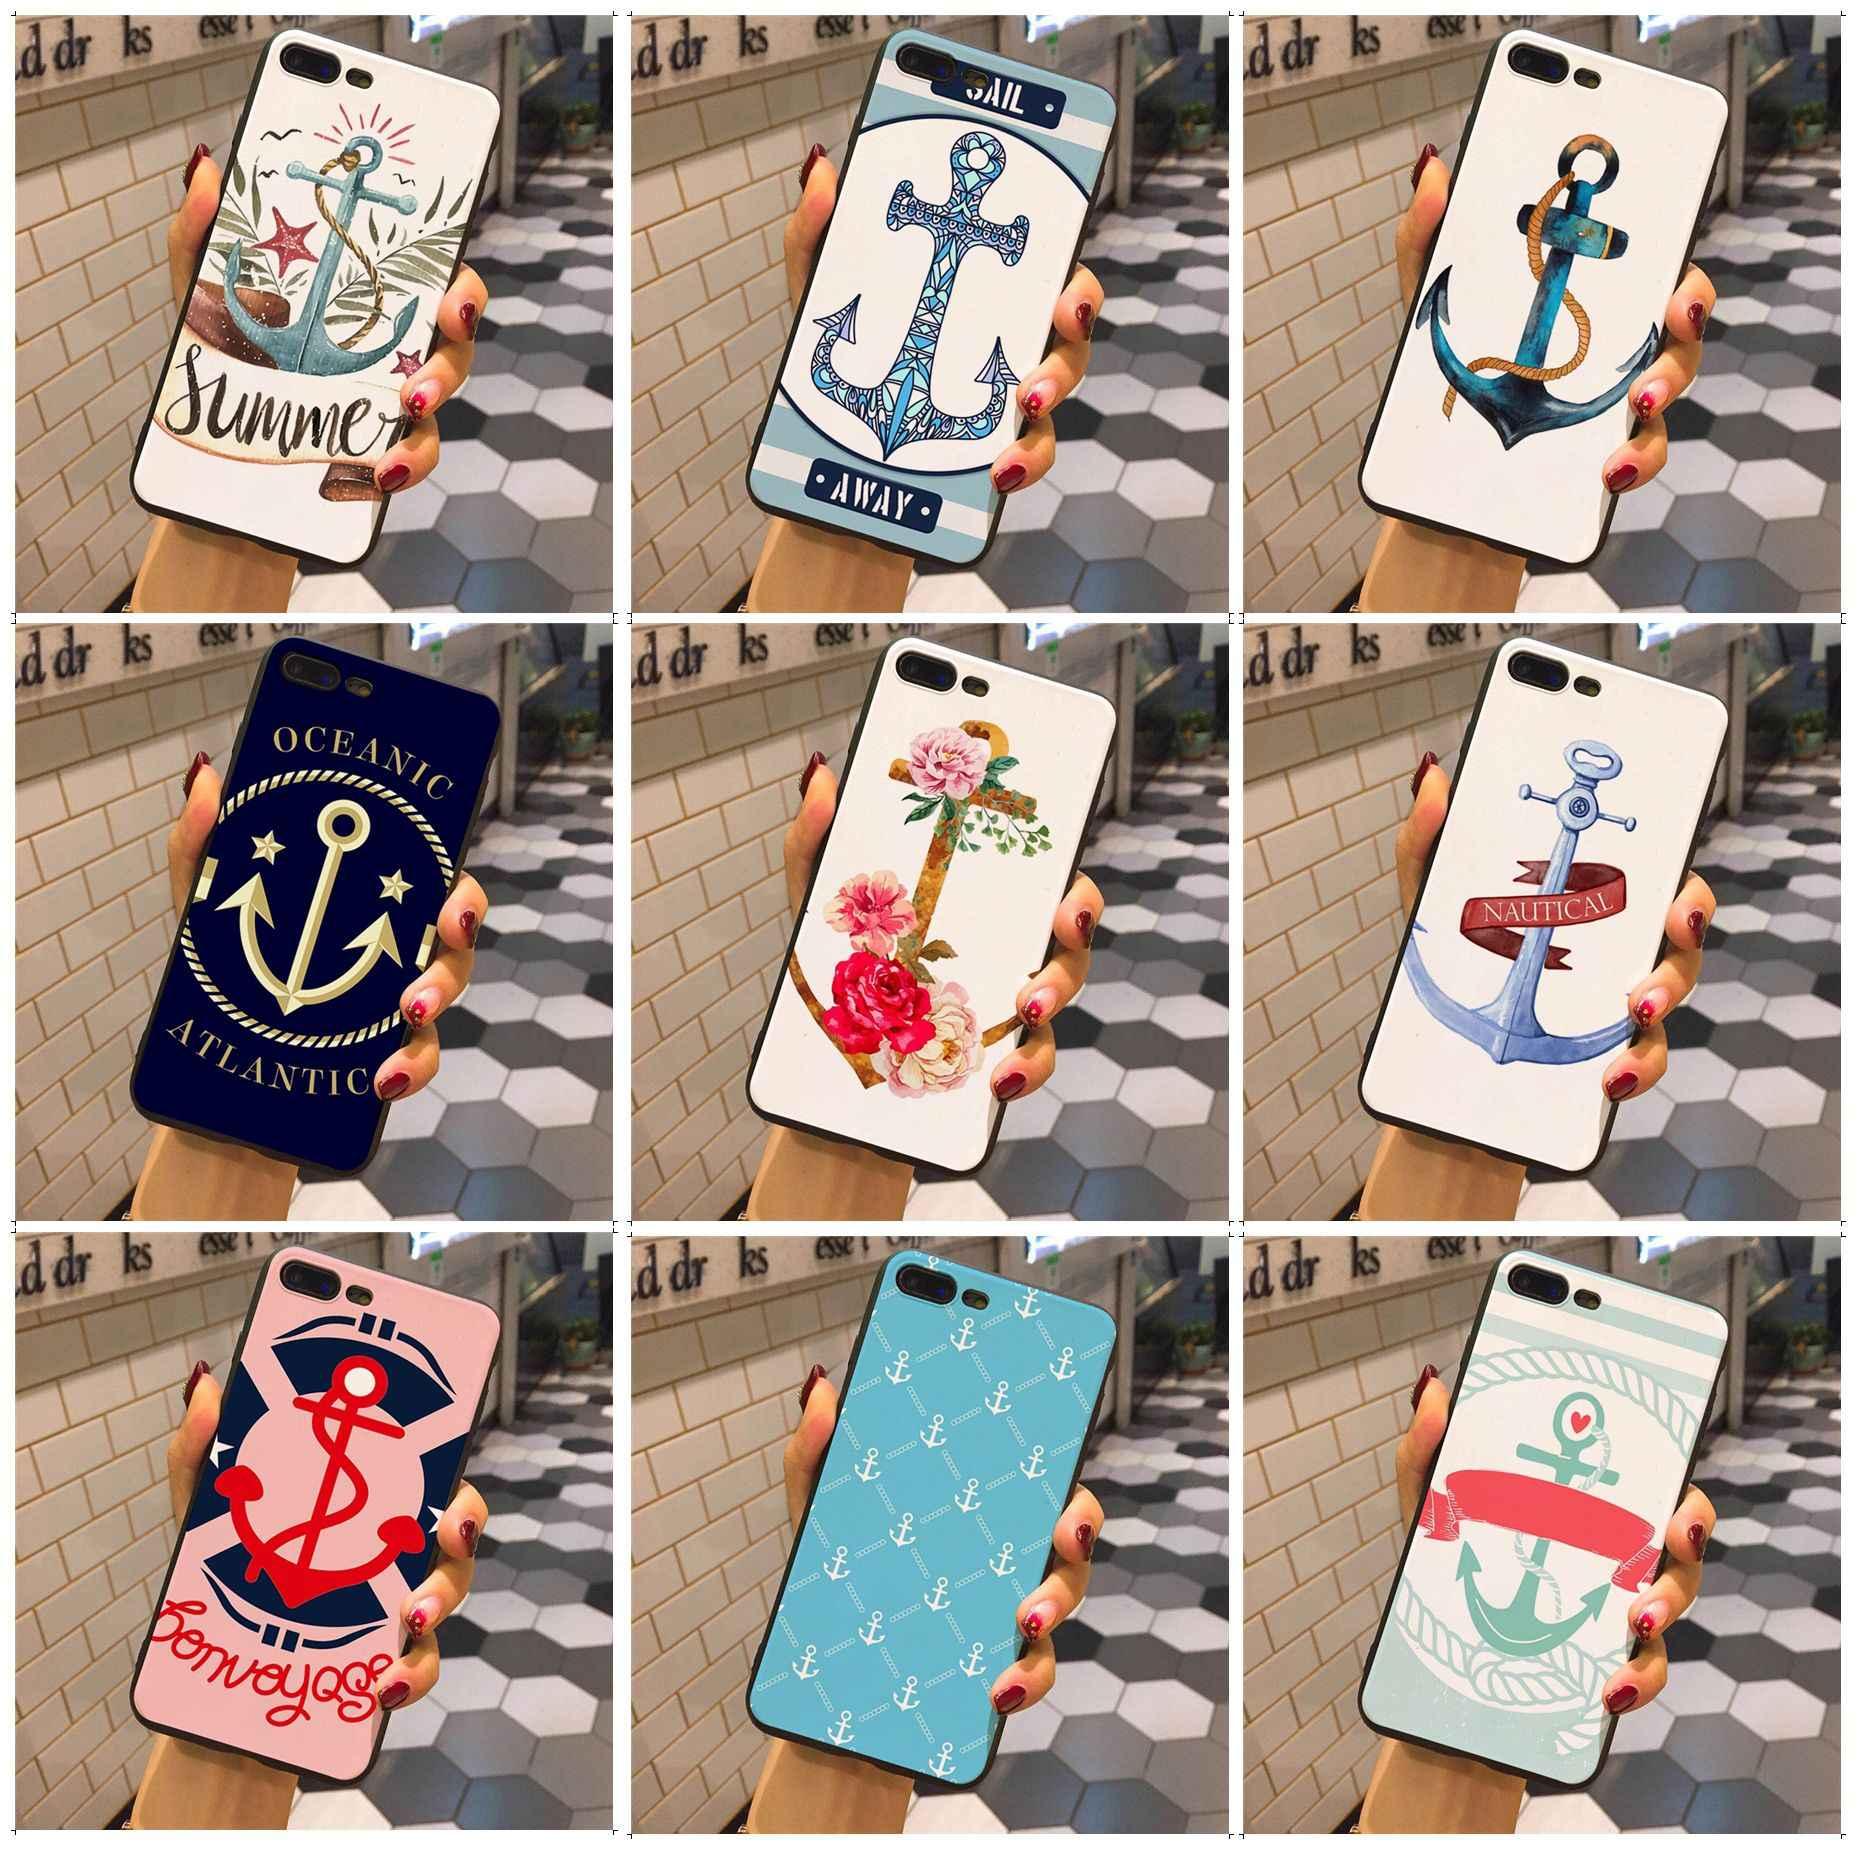 MaiYaCa Nautical Anchor โรแมนติก Retro Design ทาสีสไตล์โทรศัพท์กรณีสำหรับ iphone 7 7plus X XS XR 8 8plus 6 6s 6plus 5 5s SE